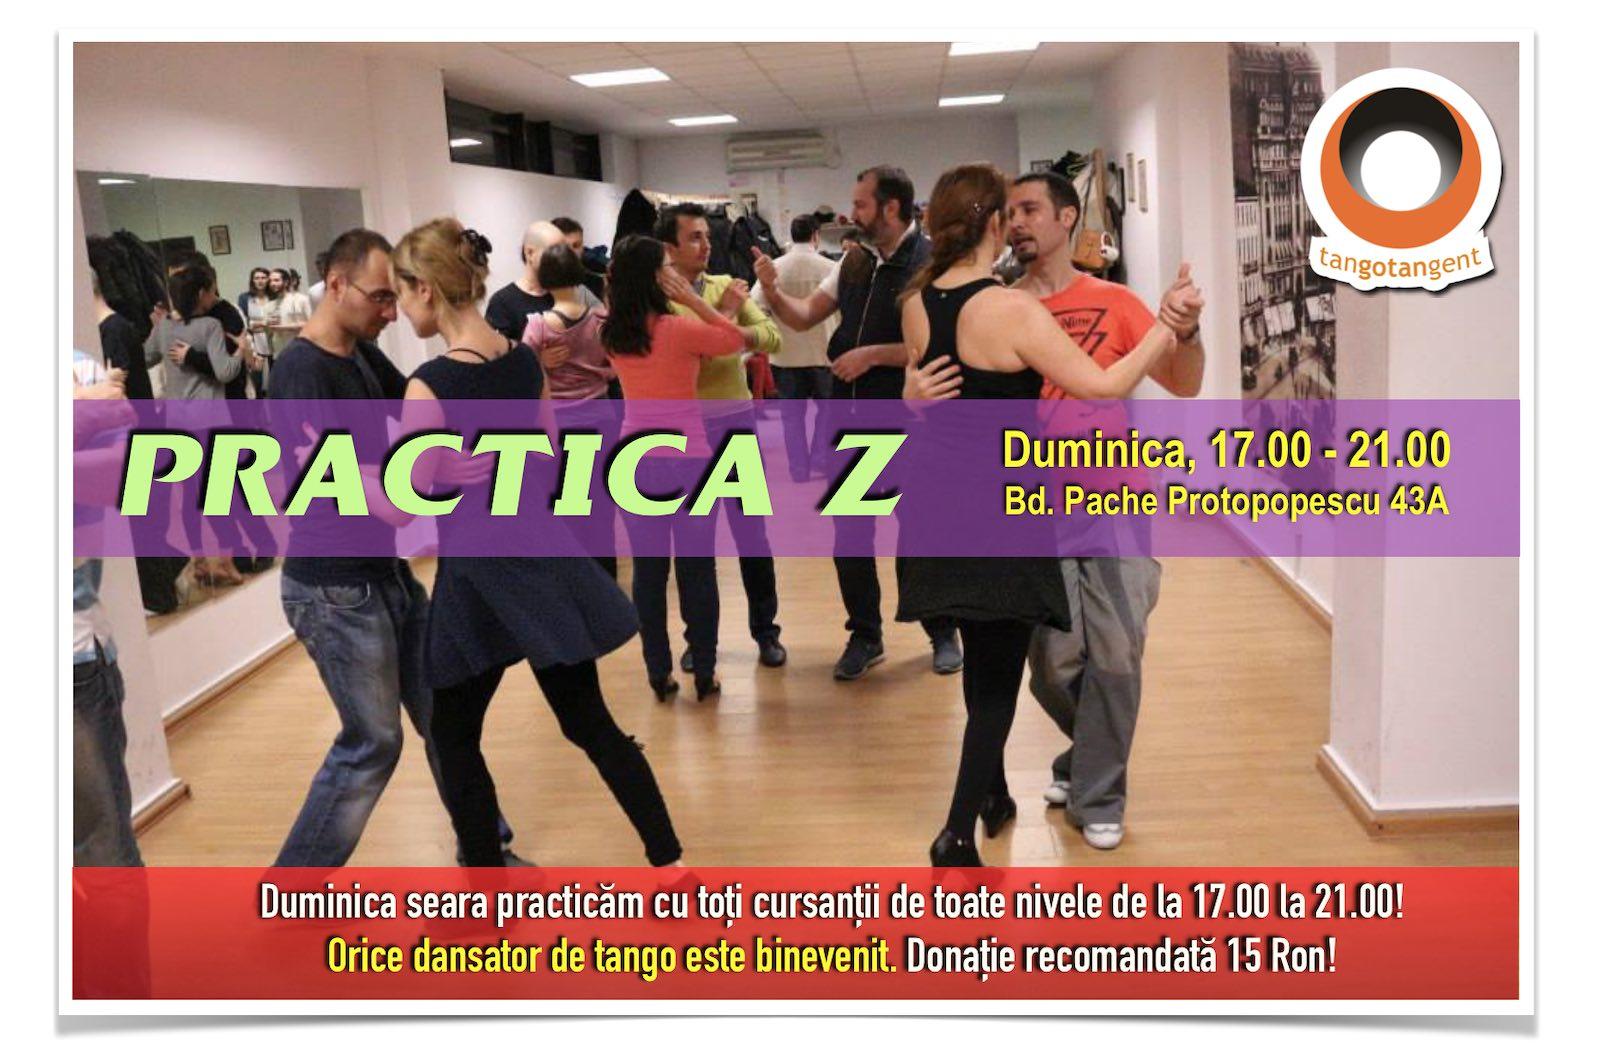 practica-z-tango-tangent-argentinian-1-duminica